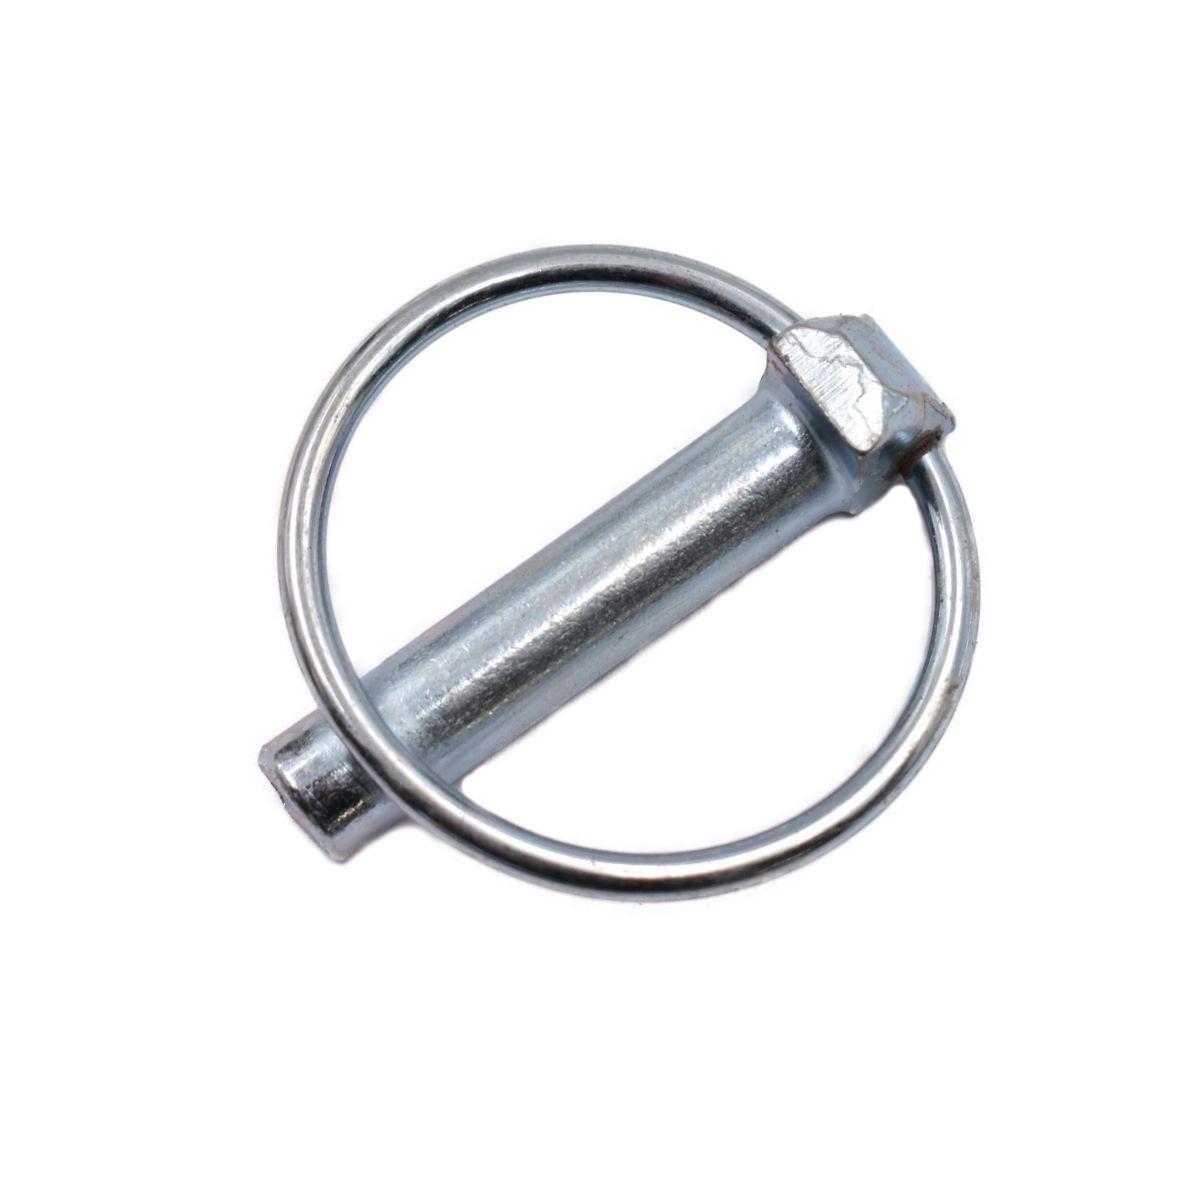 BORGCLIP 10MM Afmetingen: Diameter: 10mm Lengte: 45mm Werklengte: 36mm